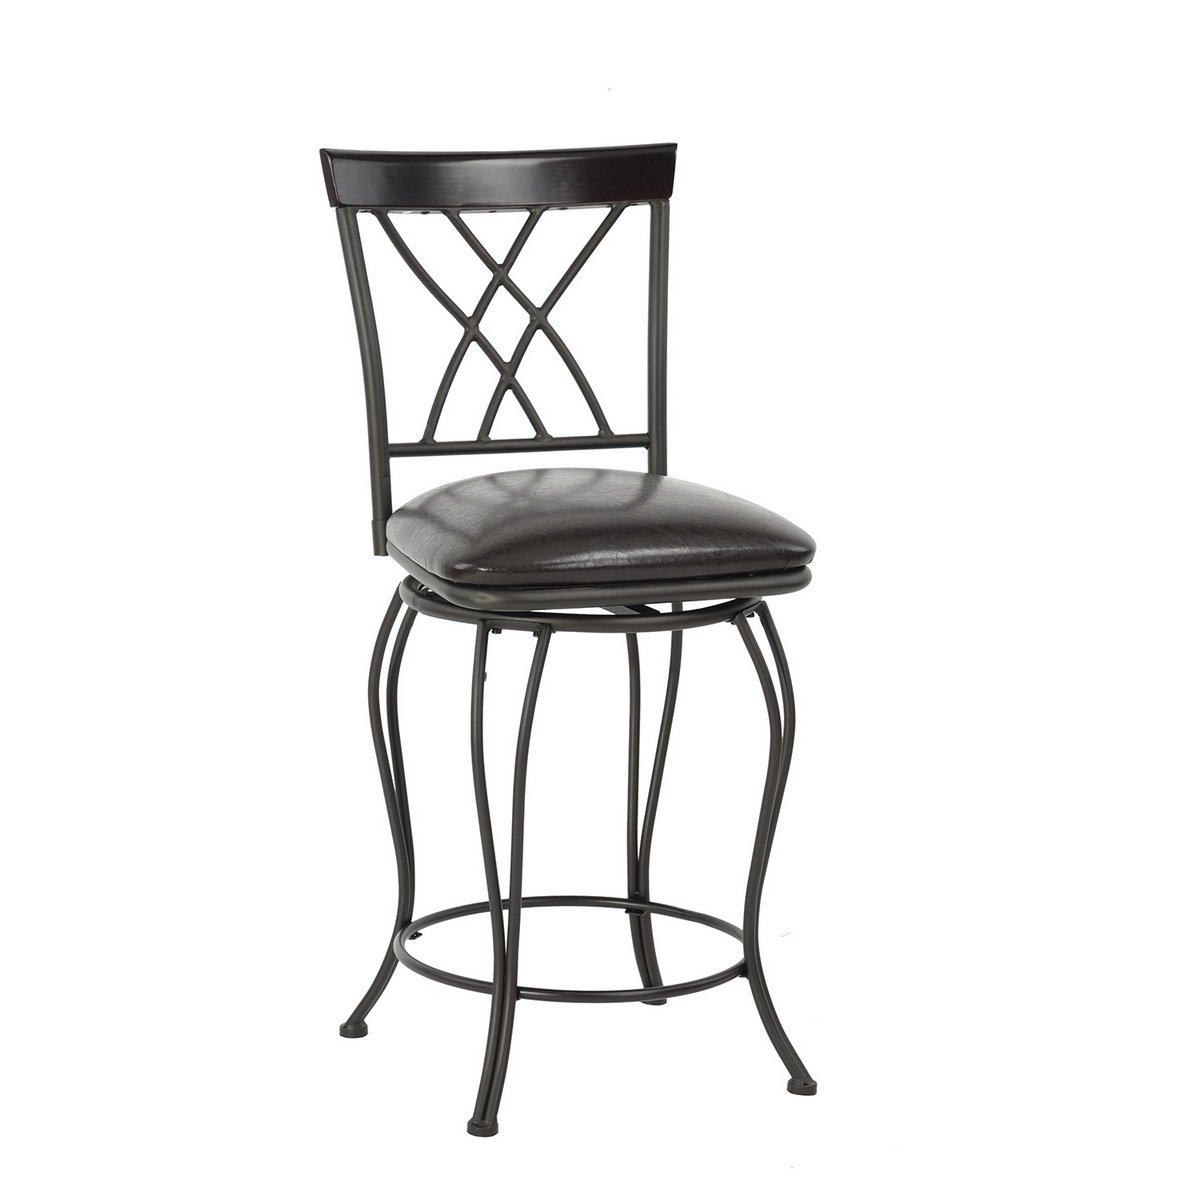 FurnitureR 24'' Circles-Back Swivel Bar stool Counter Height Bar Chair by FurnitureR (Image #3)